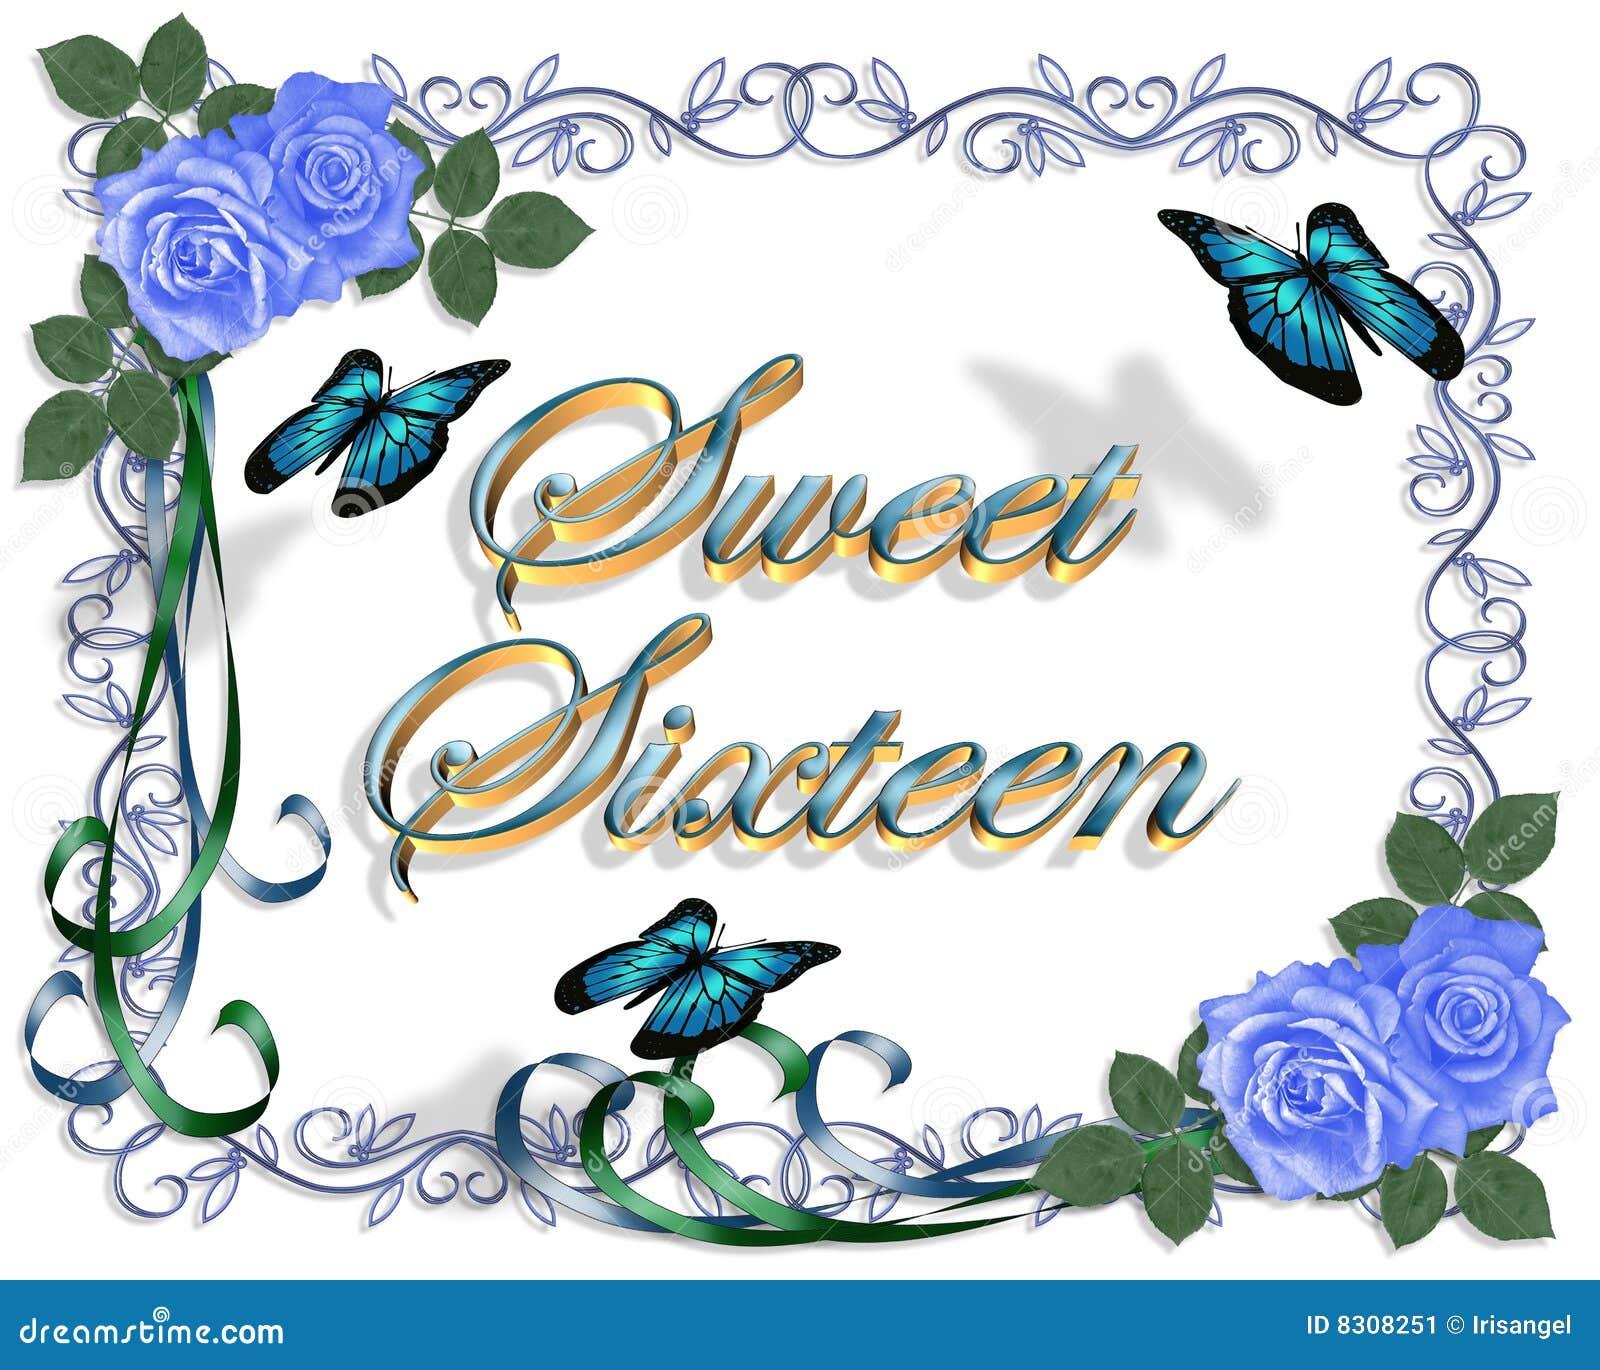 Sweet 16 birthday invitation border stock illustration sweet 16 birthday blue roses border stock image kristyandbryce Choice Image